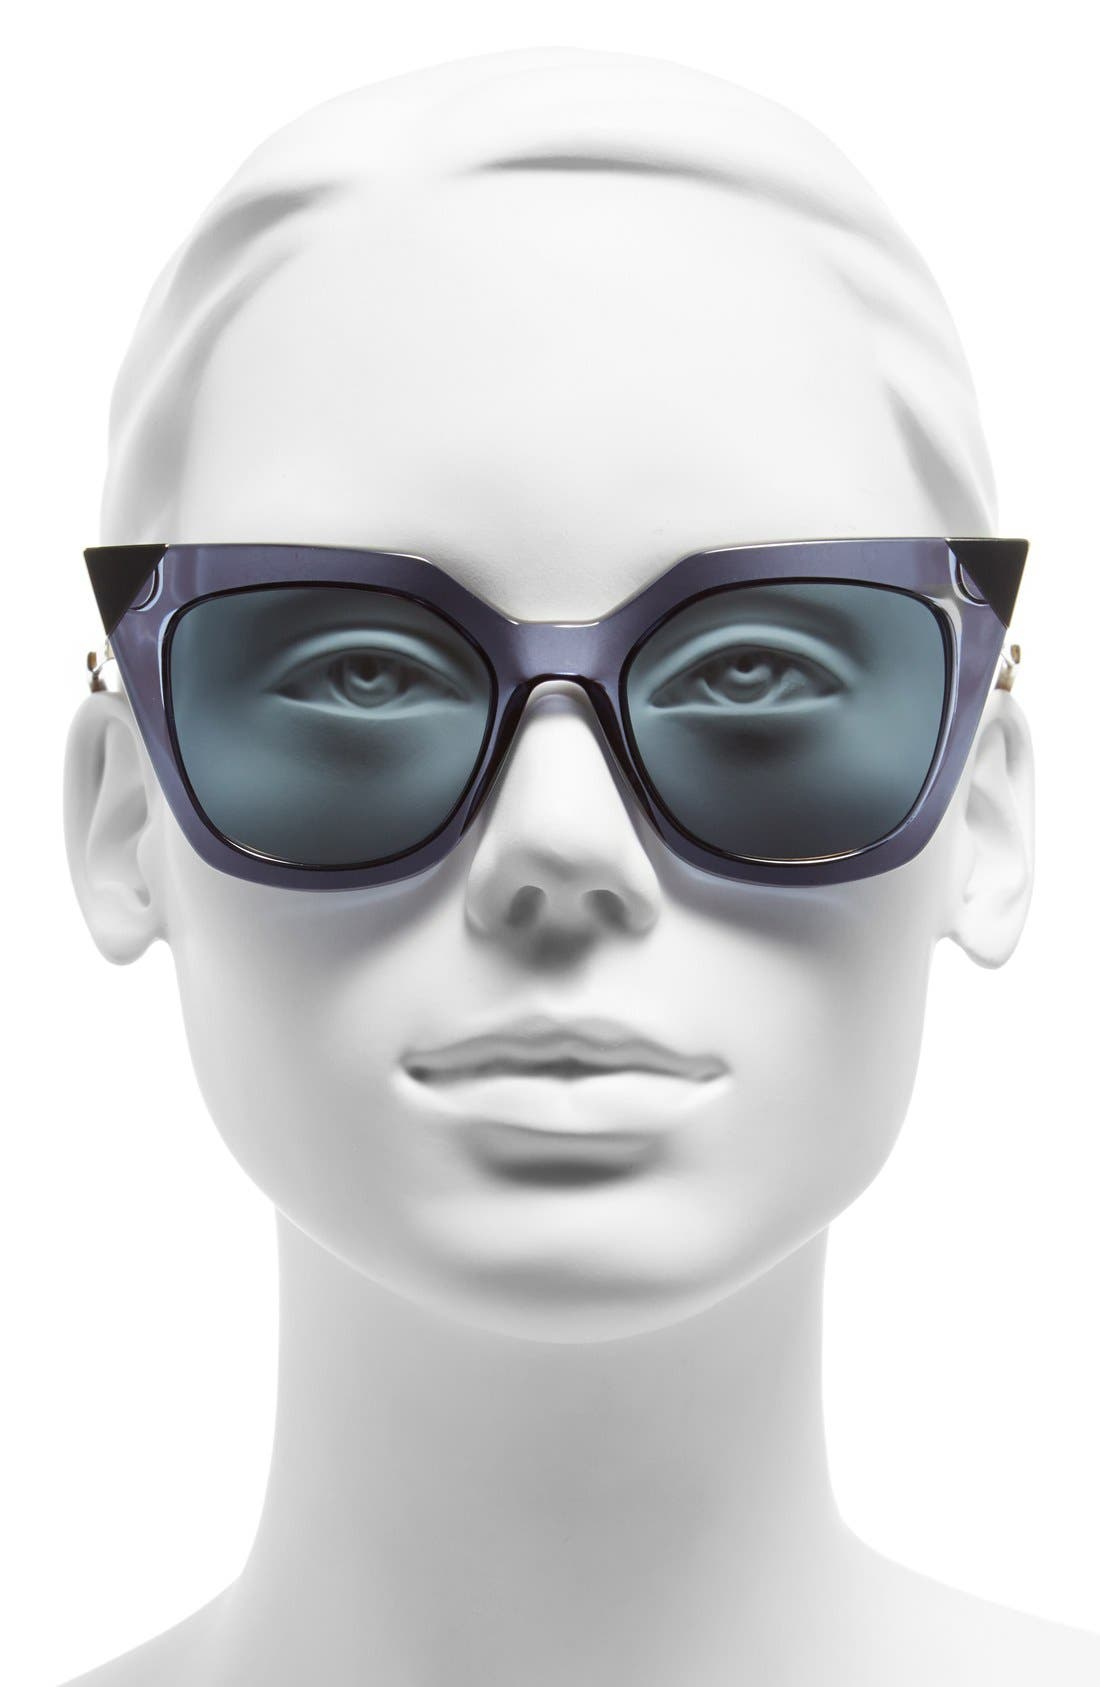 52mm Cat Eye Sunglasses,                             Alternate thumbnail 13, color,